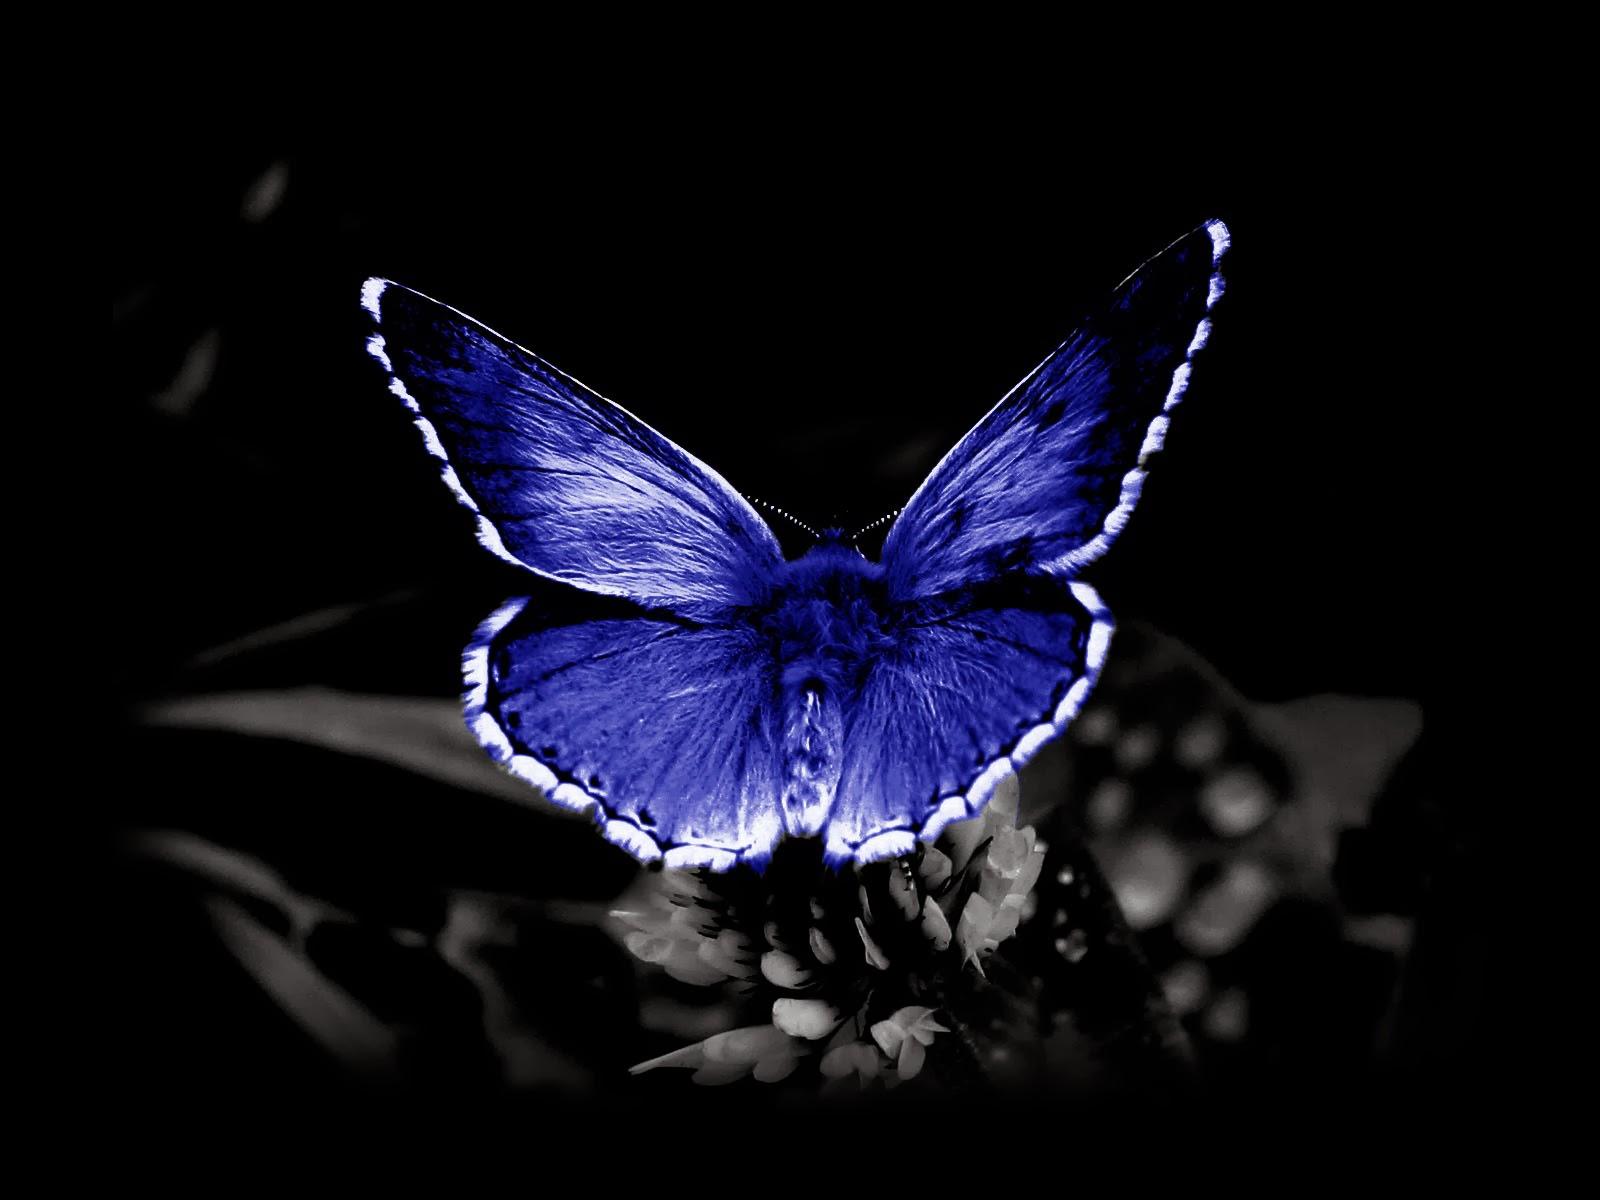 wallpapers Butterfly Desktop Backgrounds 1600x1200